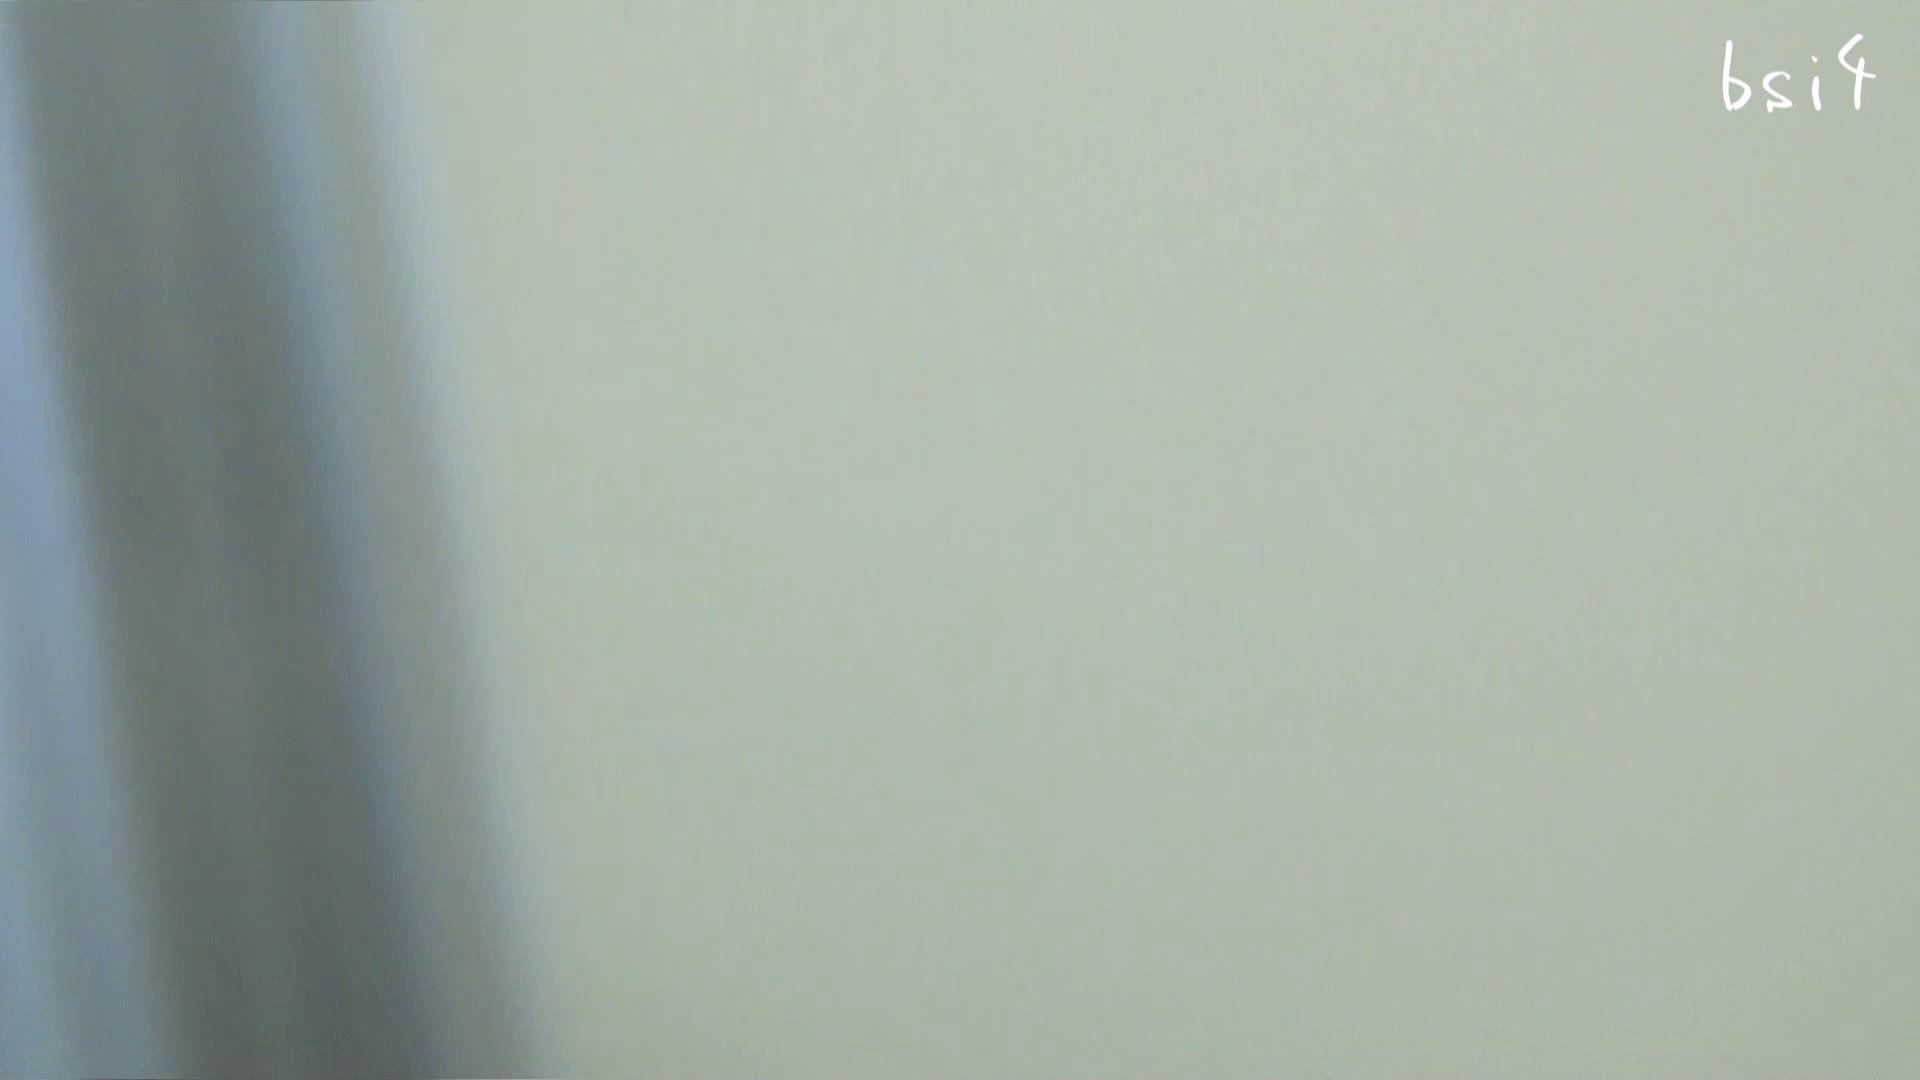 至高下半身盗撮-PREMIUM-【院内病棟編 】VOL4 OLの実態  86pic 28